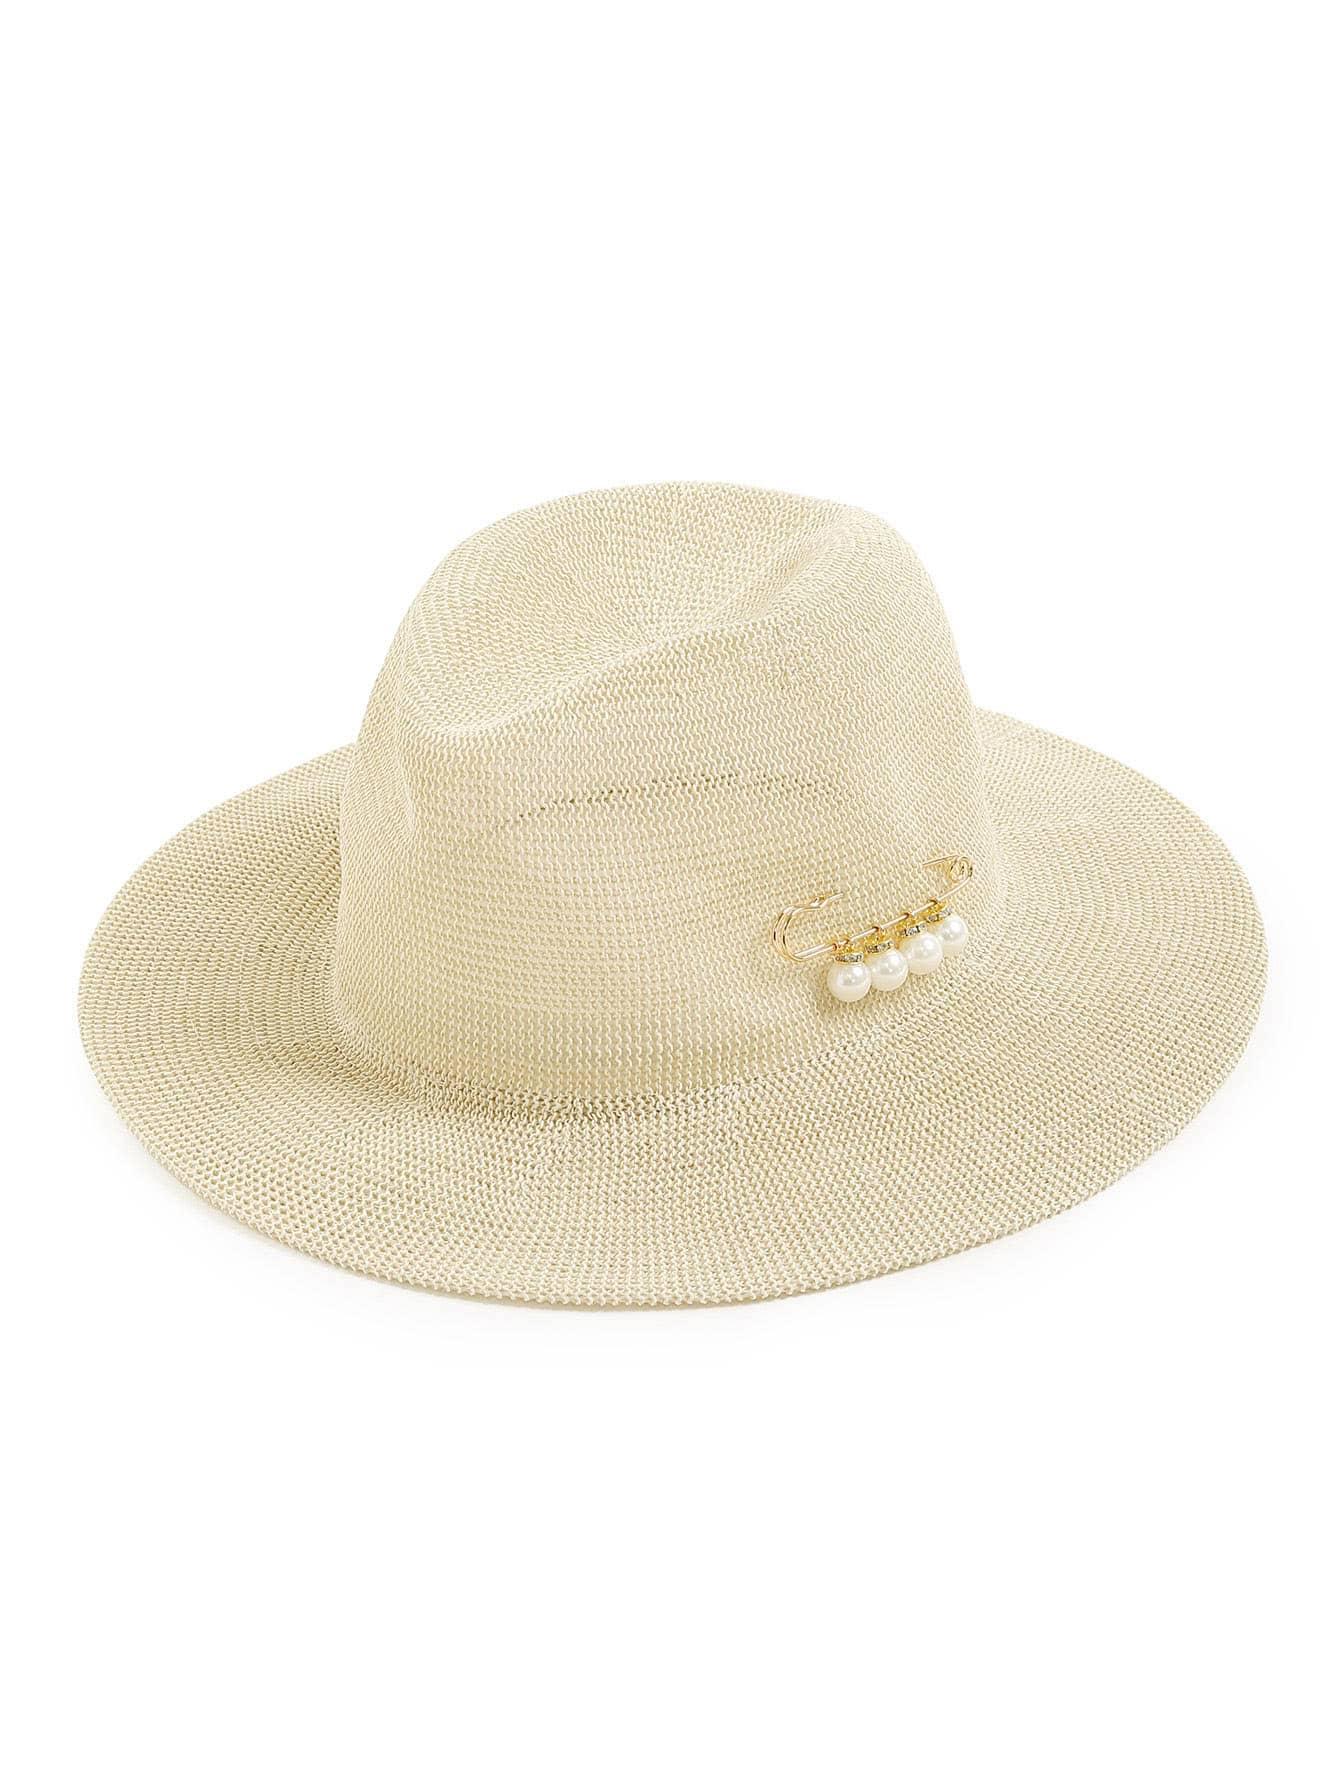 Фото Faux Pearl Pin Fedora Hat. Купить с доставкой